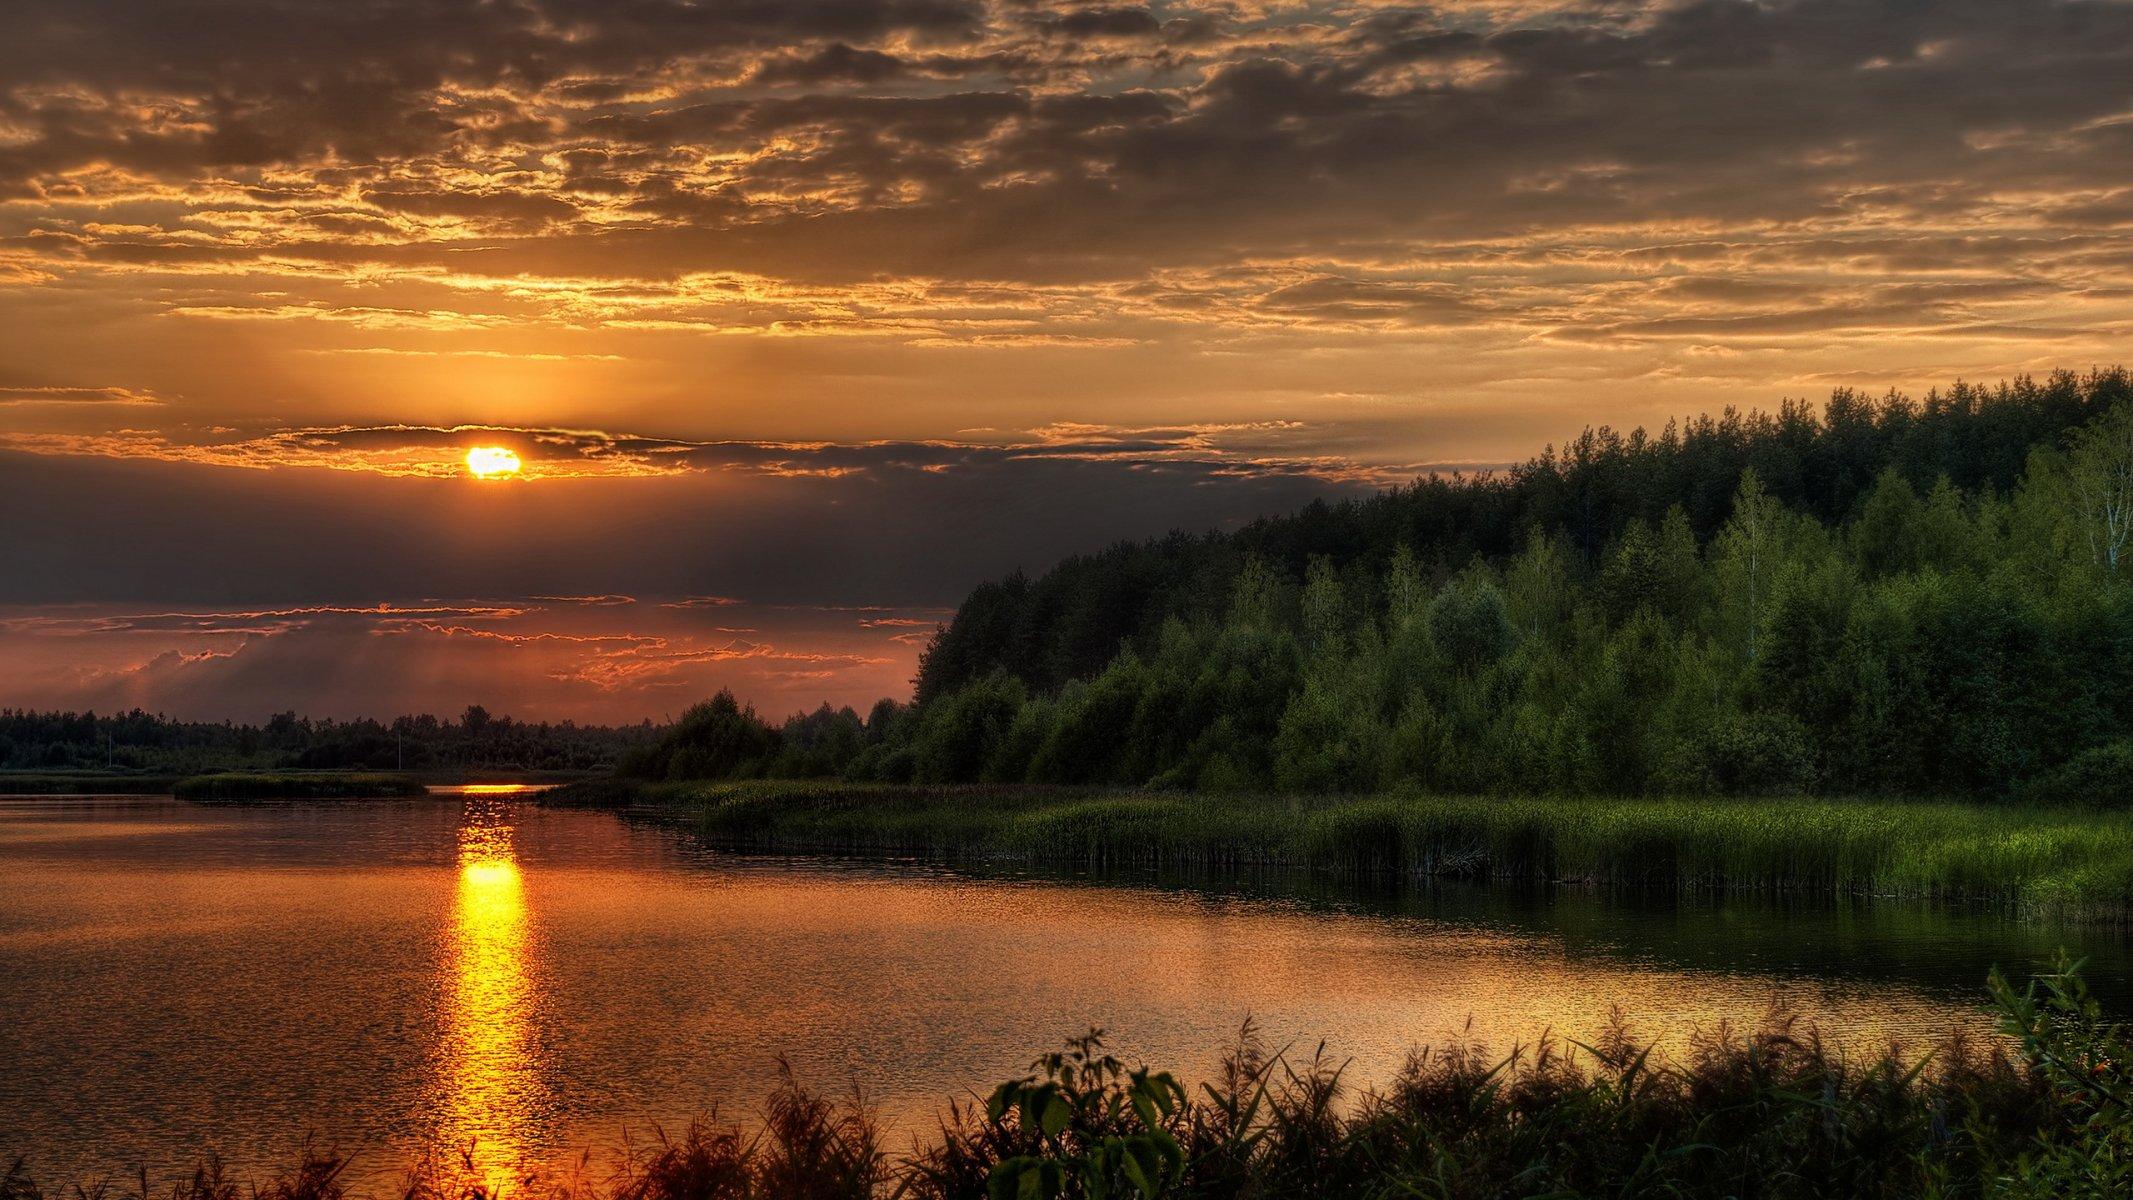 Картинки про, картинки природа закат красивые